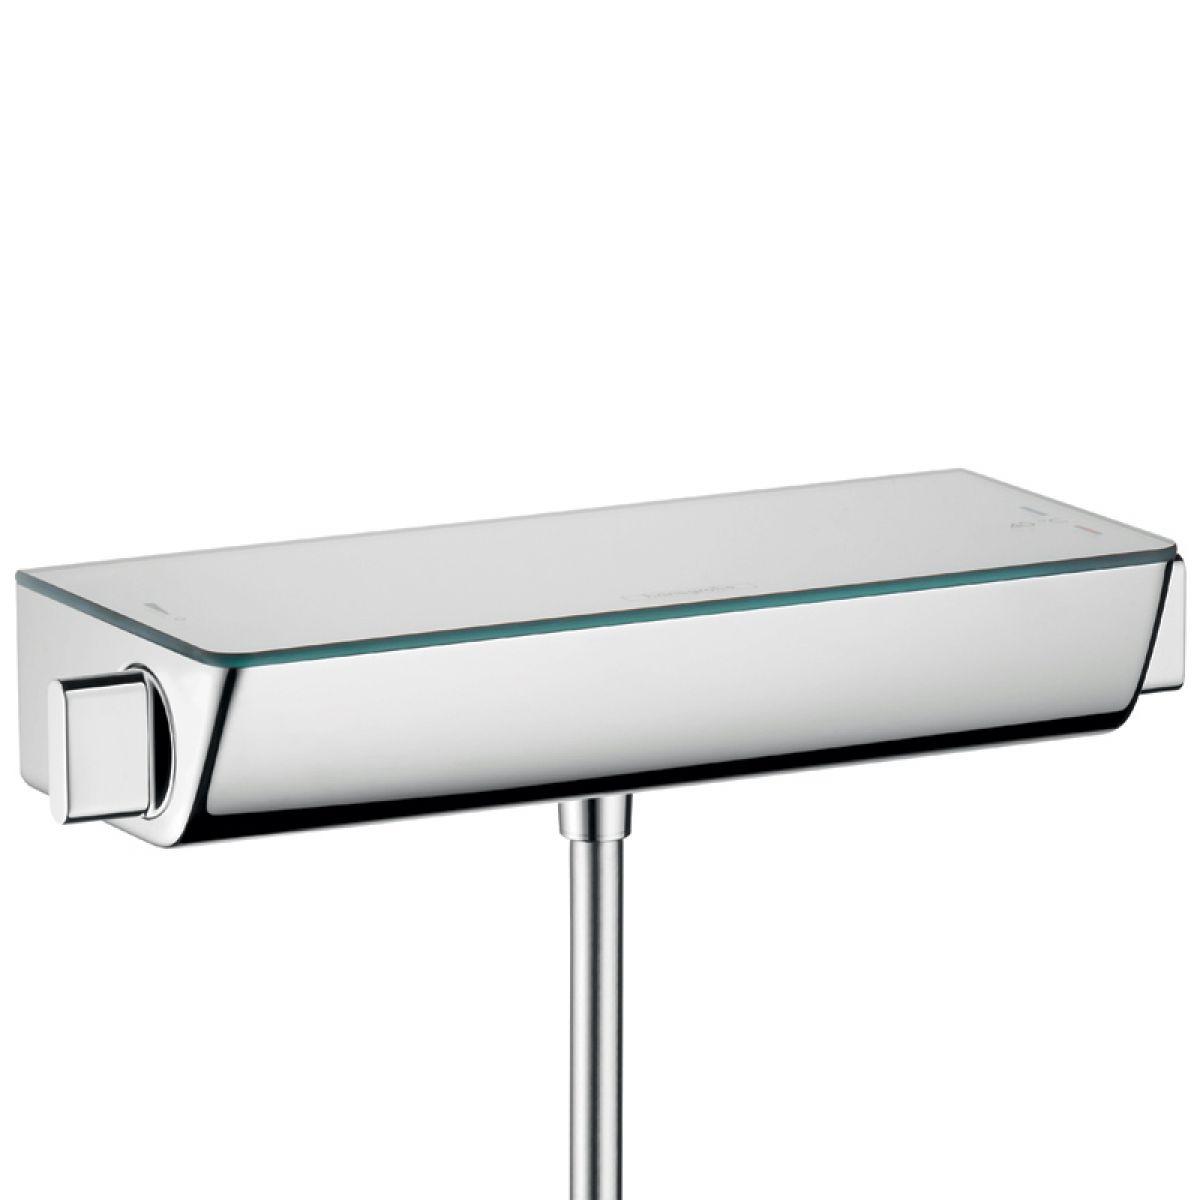 hansgrohe raindance select 150 combi shower kit uk bathrooms. Black Bedroom Furniture Sets. Home Design Ideas